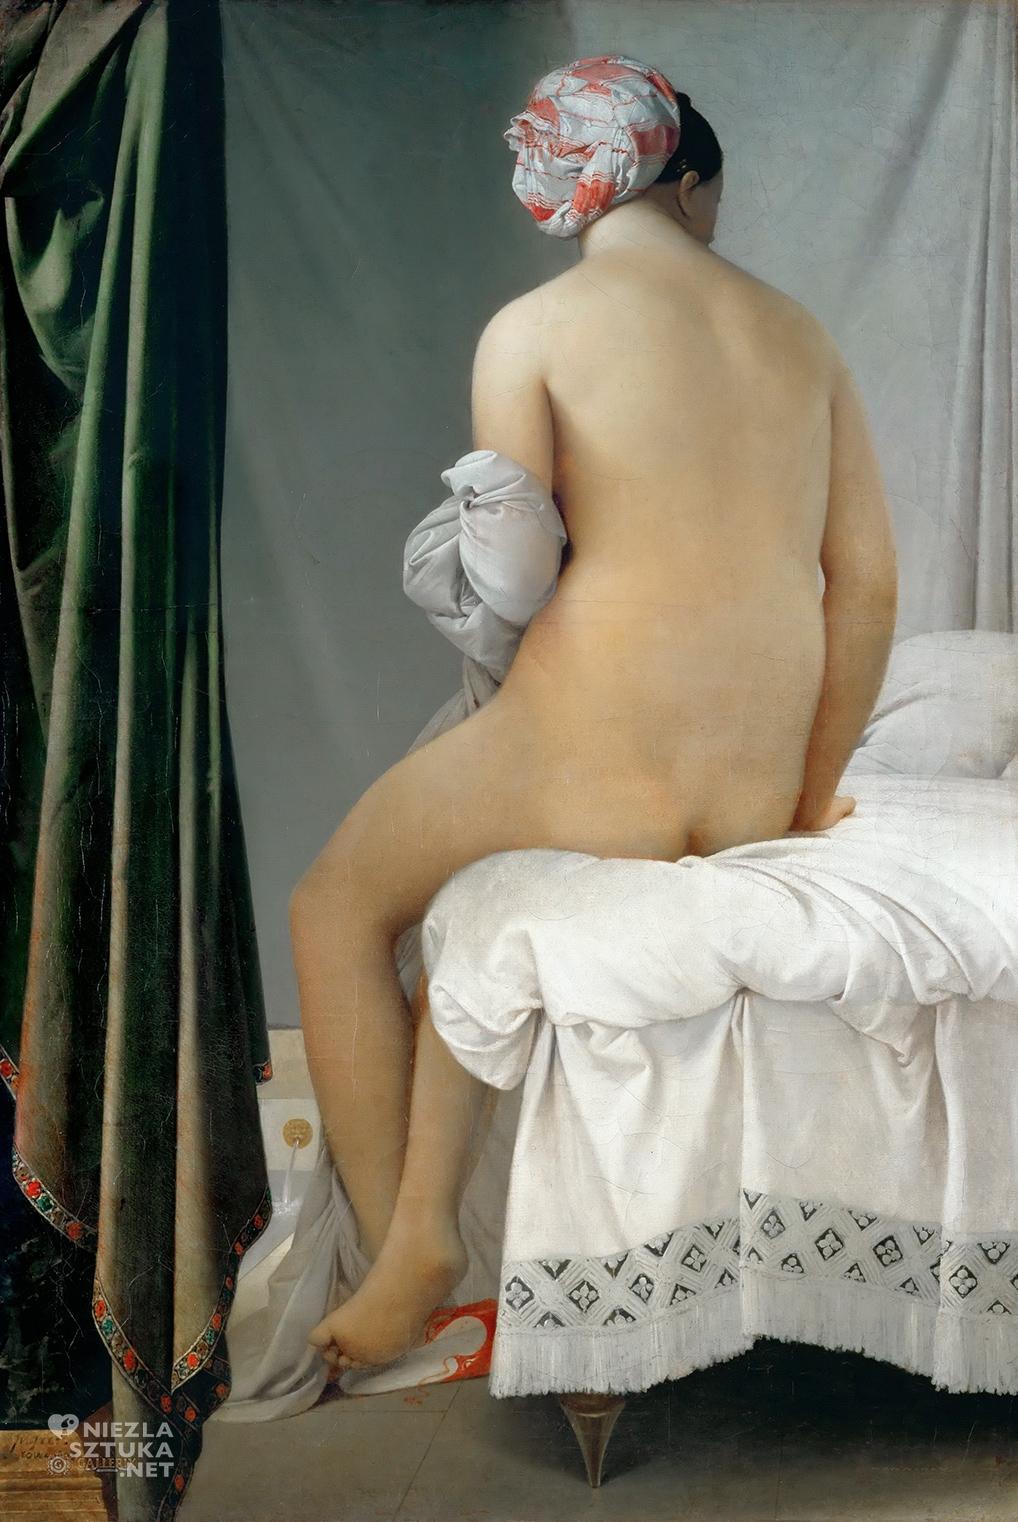 Jean-Auguste-Dominique Ingres <em>Kąpiąca się</em> | 1808, 146 × 97 cm, Luwr